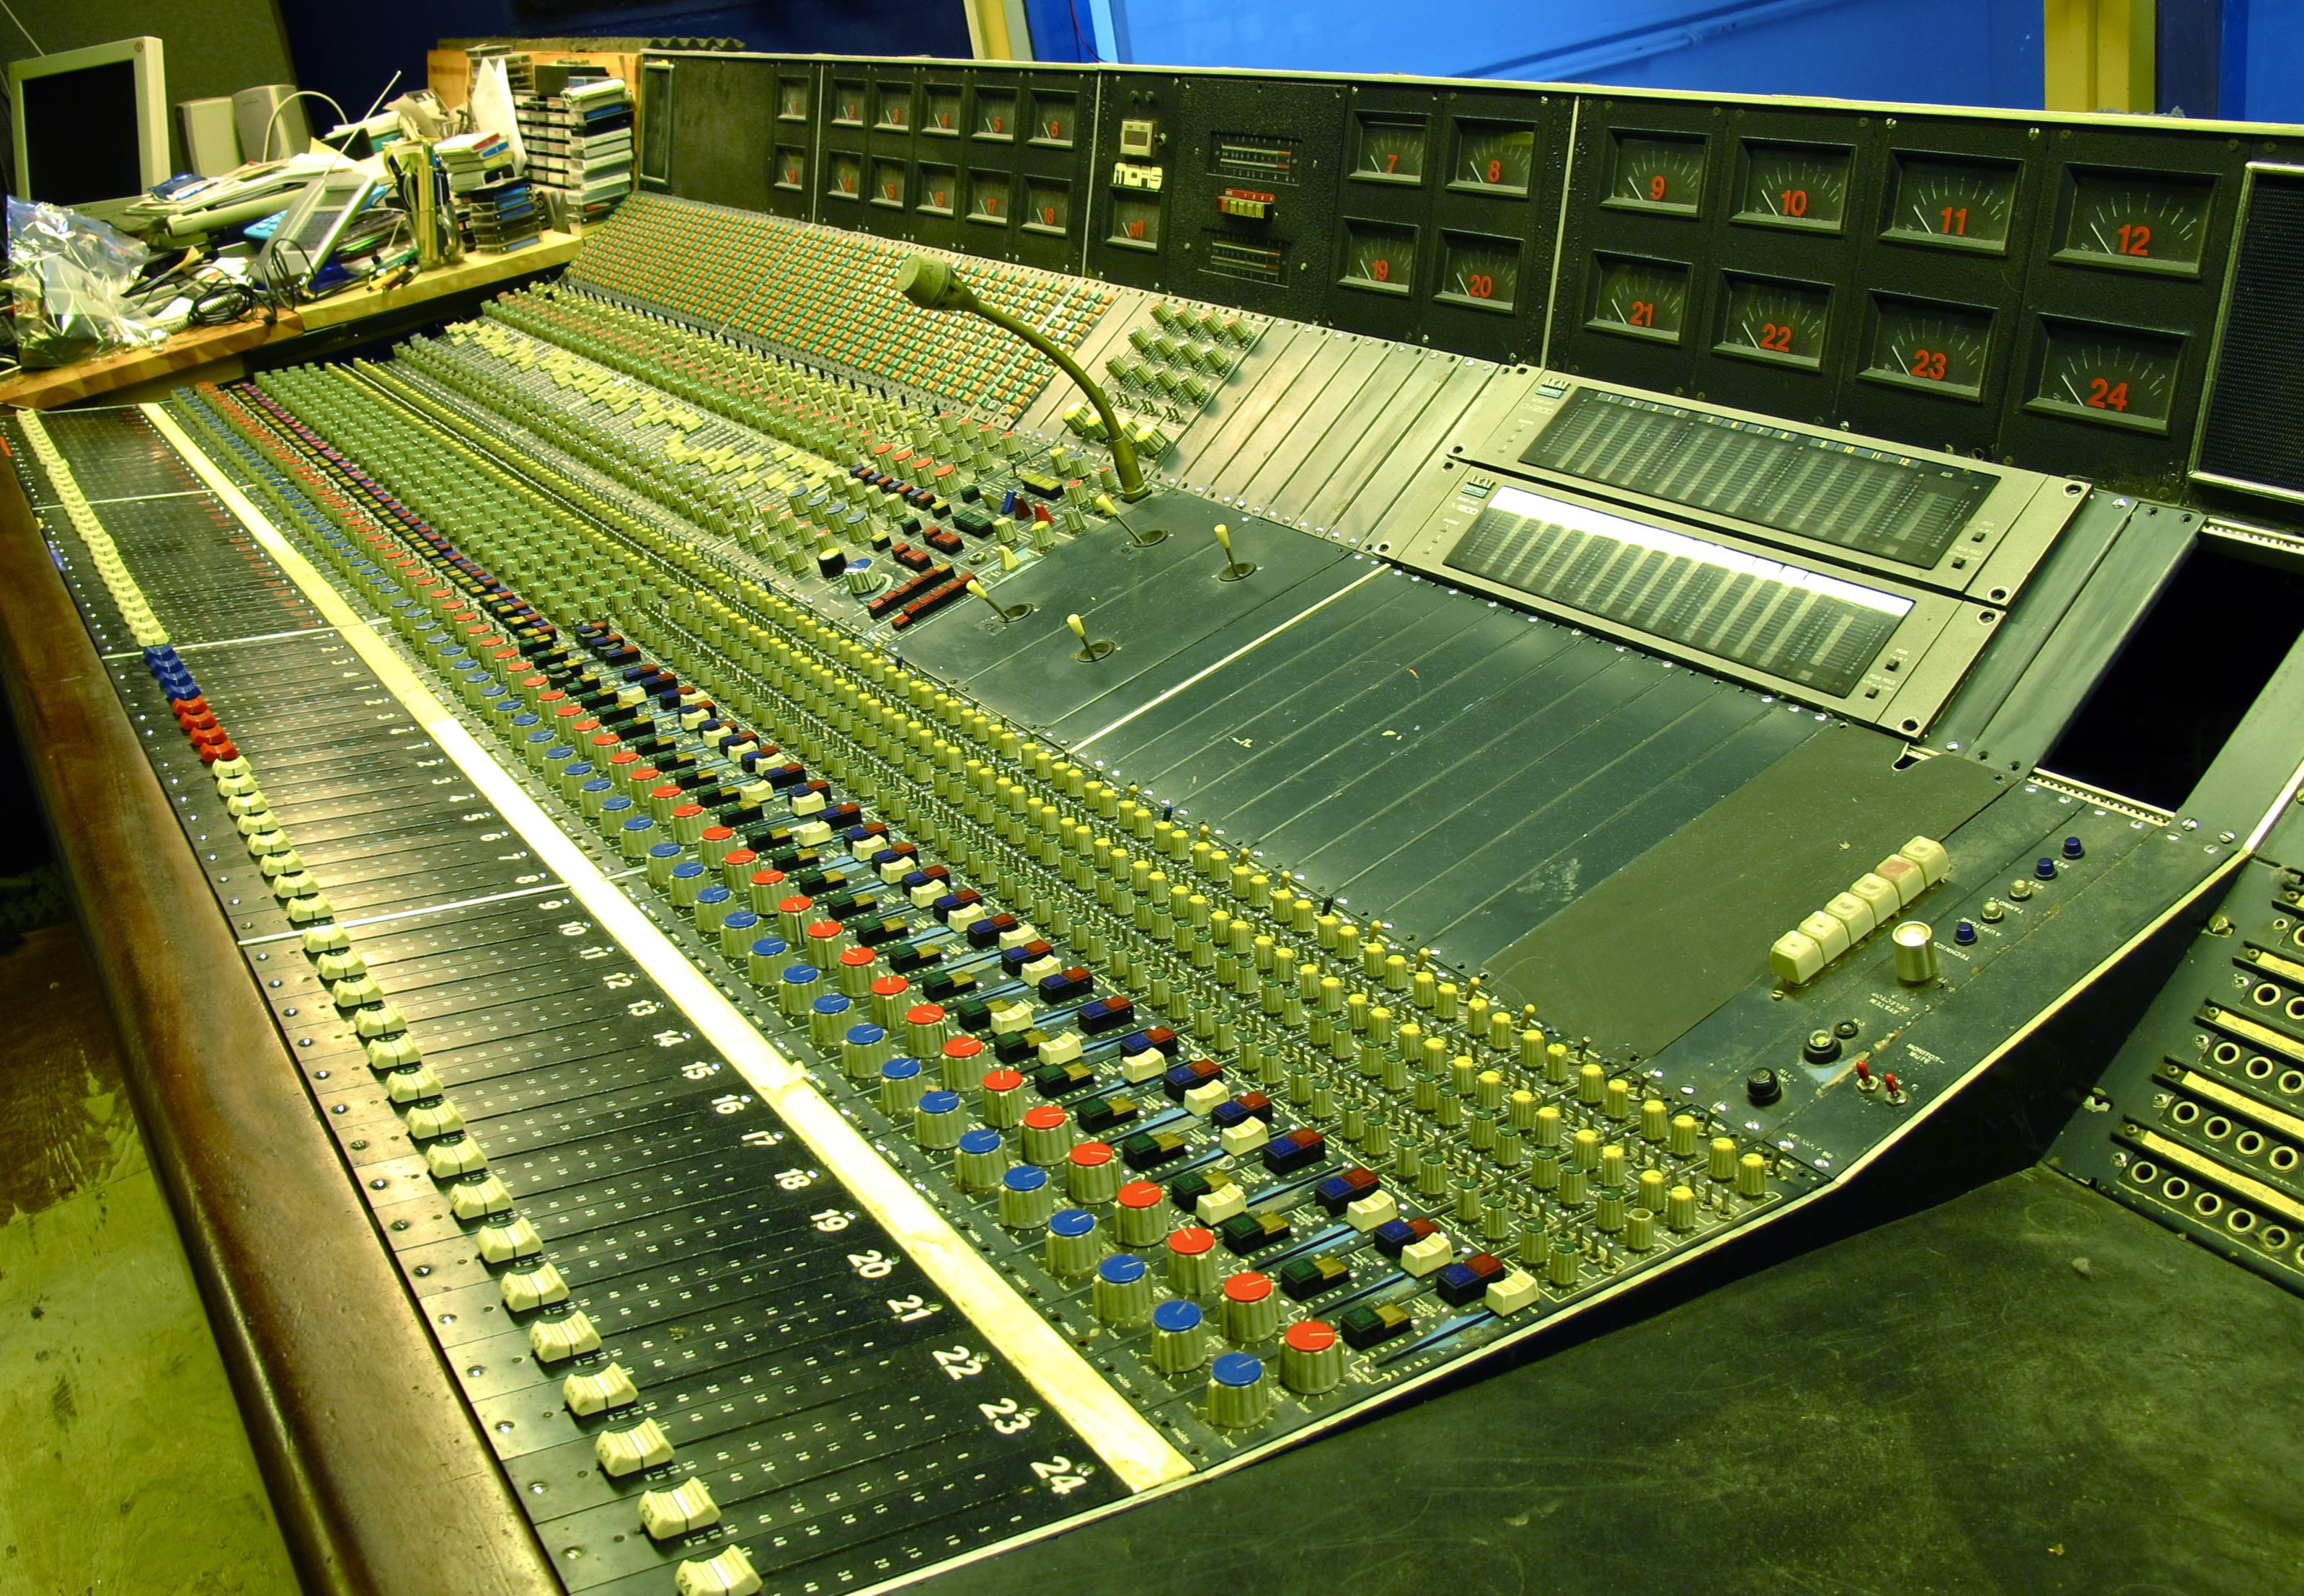 1976 midas quadraphonic studio desk gearslutz pro audio community. Black Bedroom Furniture Sets. Home Design Ideas